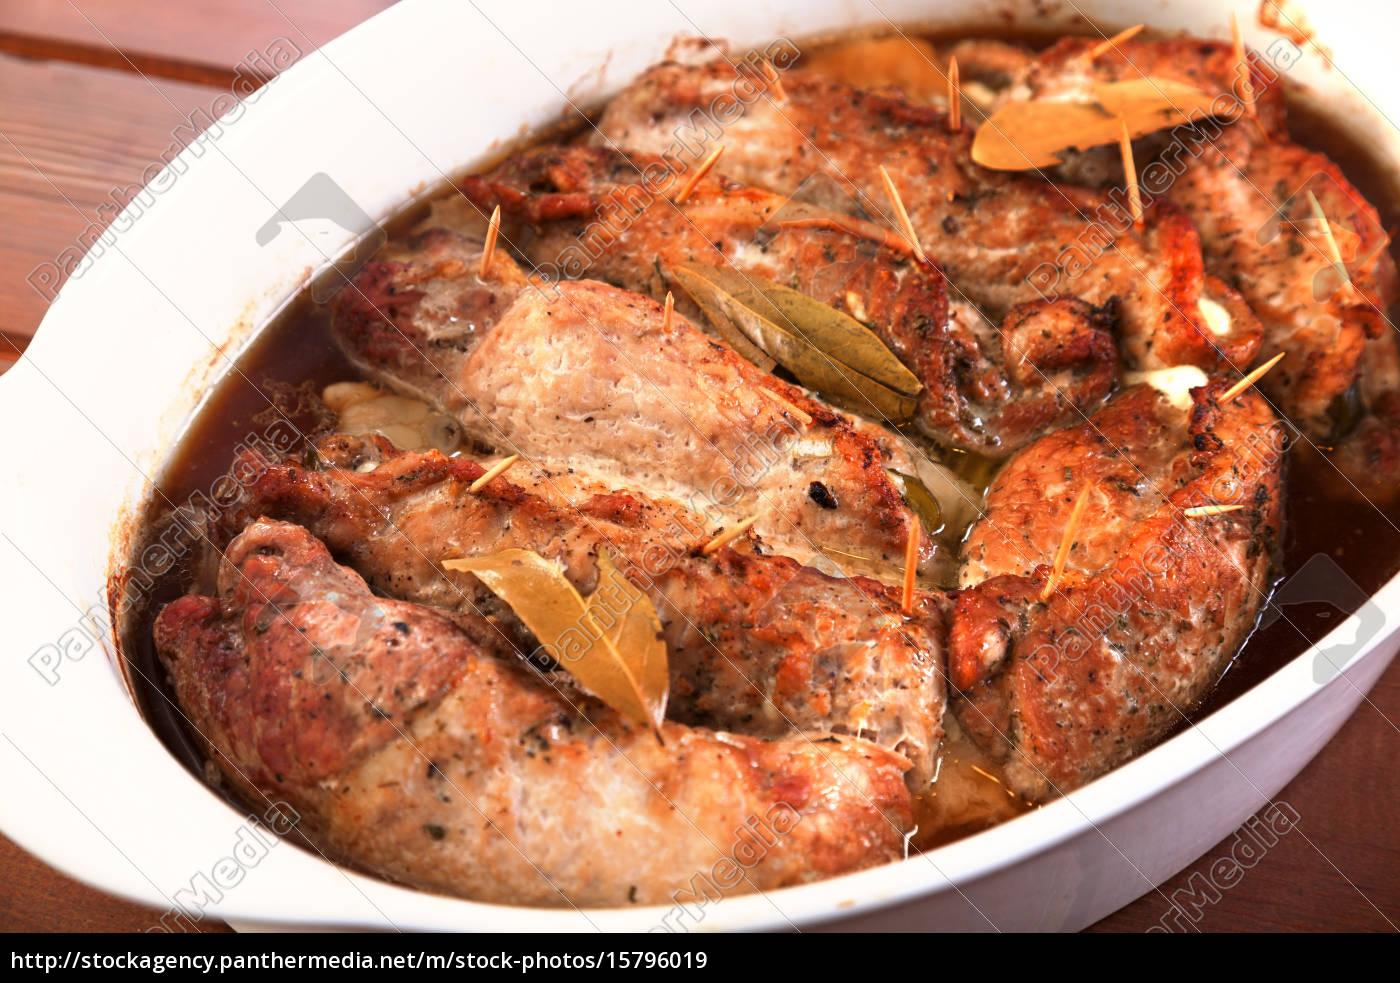 pork, roulades, pork, roulades, pork, roulades, pork, roulades, pork, roulades, pork - 15796019